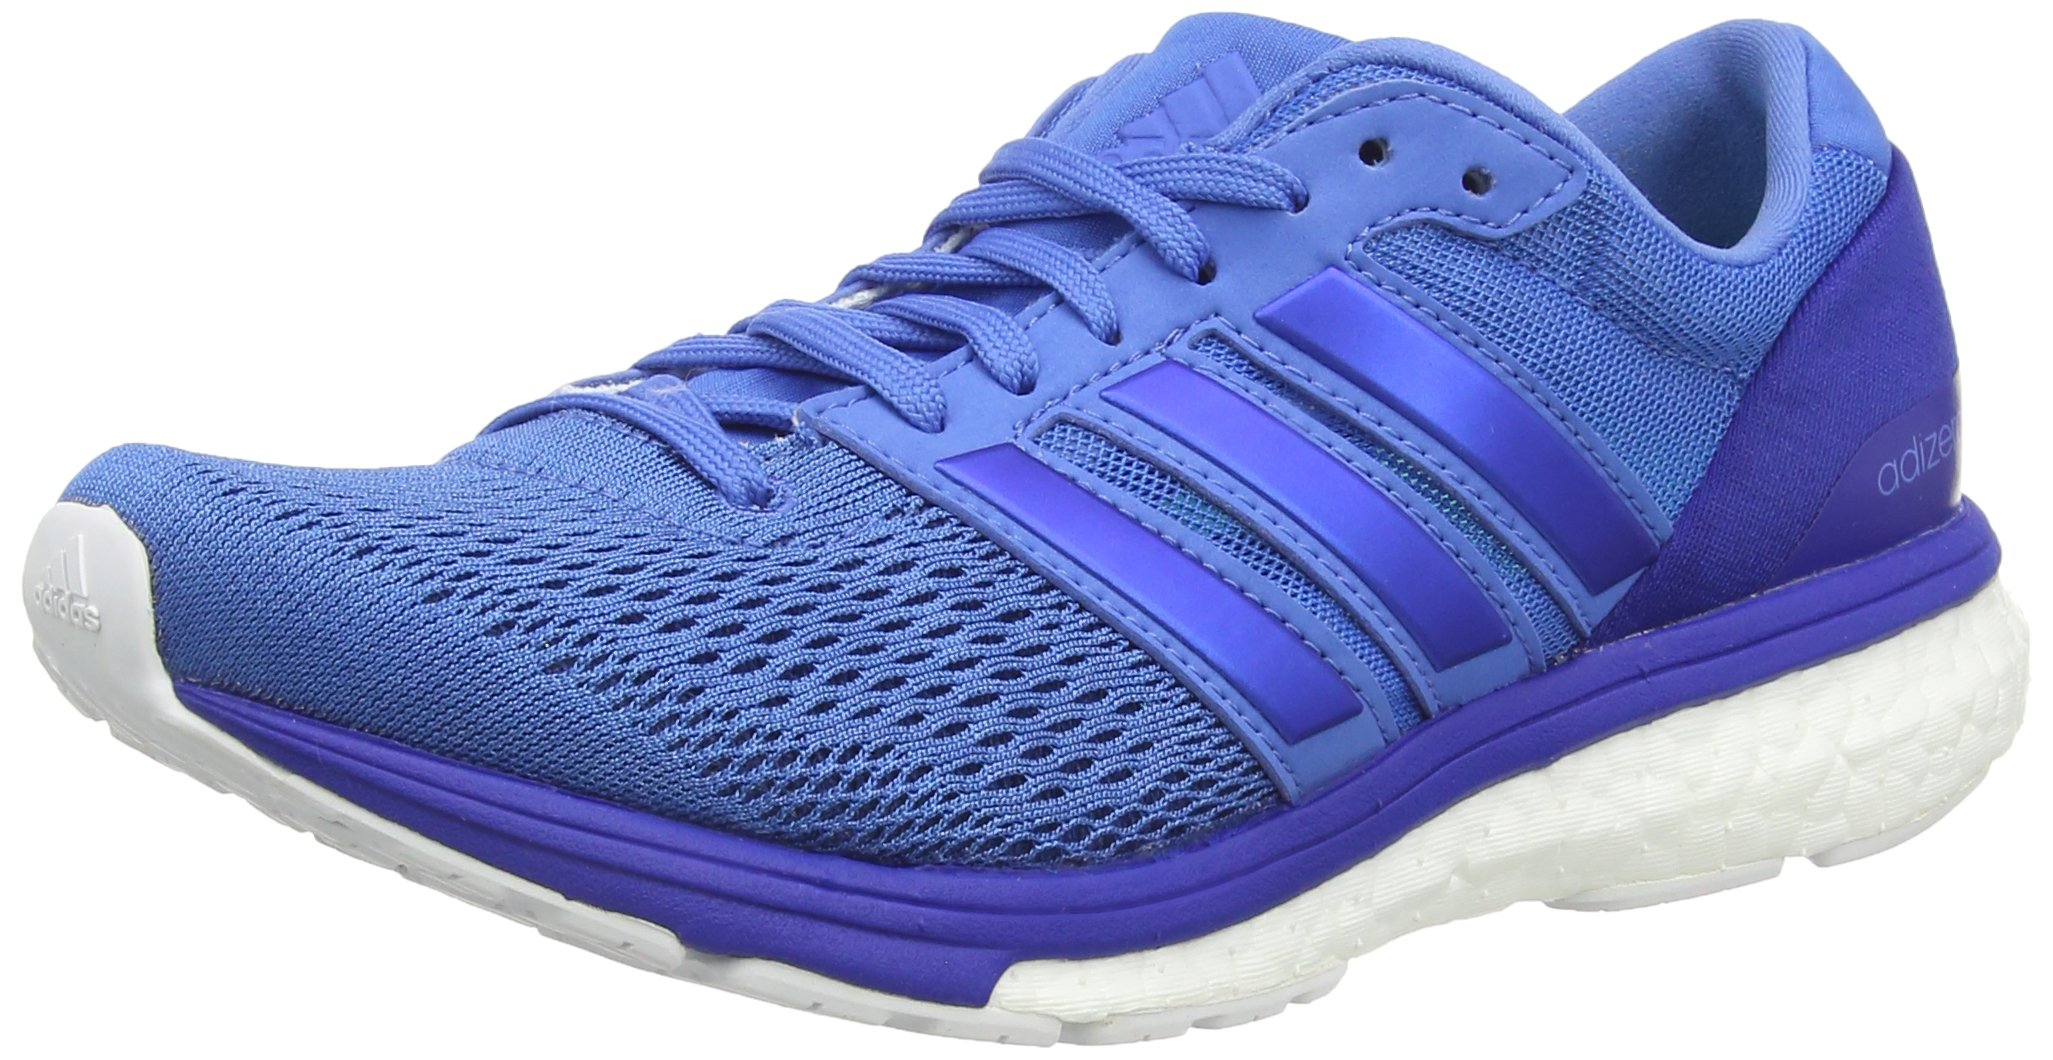 81xYfti9gFL - adidas Women's Adizero Boston 6 Competition Running Shoes